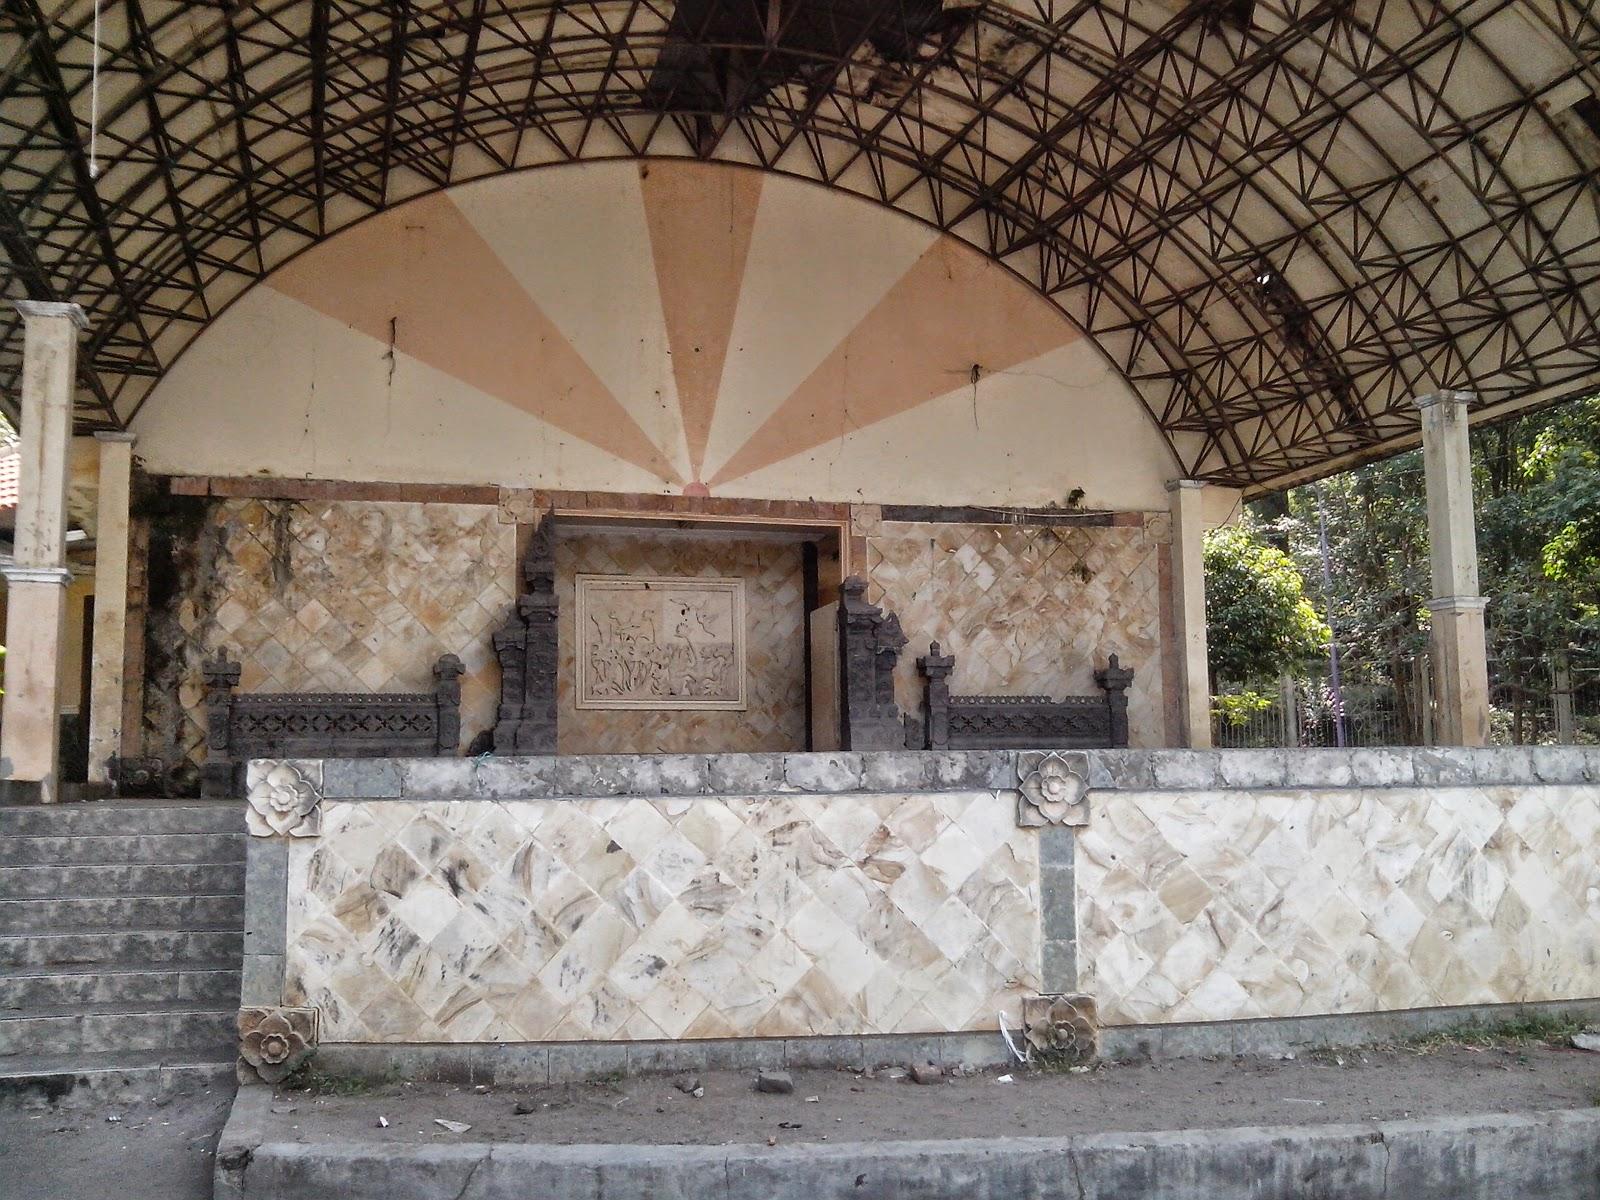 Panggung hiburan Taman Wisata Air Goa Selo Mangleng